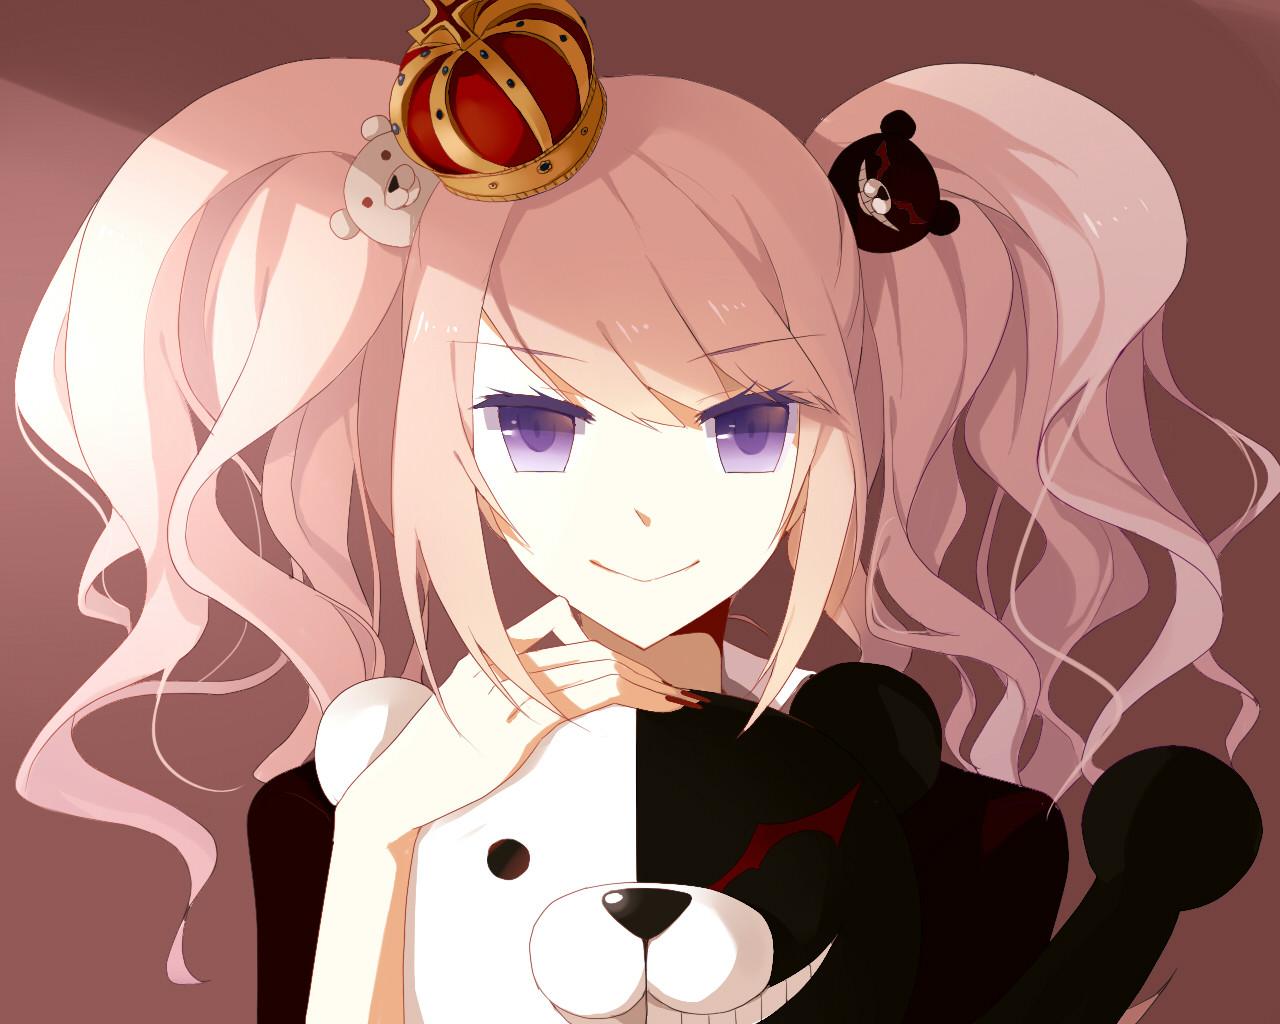 Kyouko kirigiri art 2